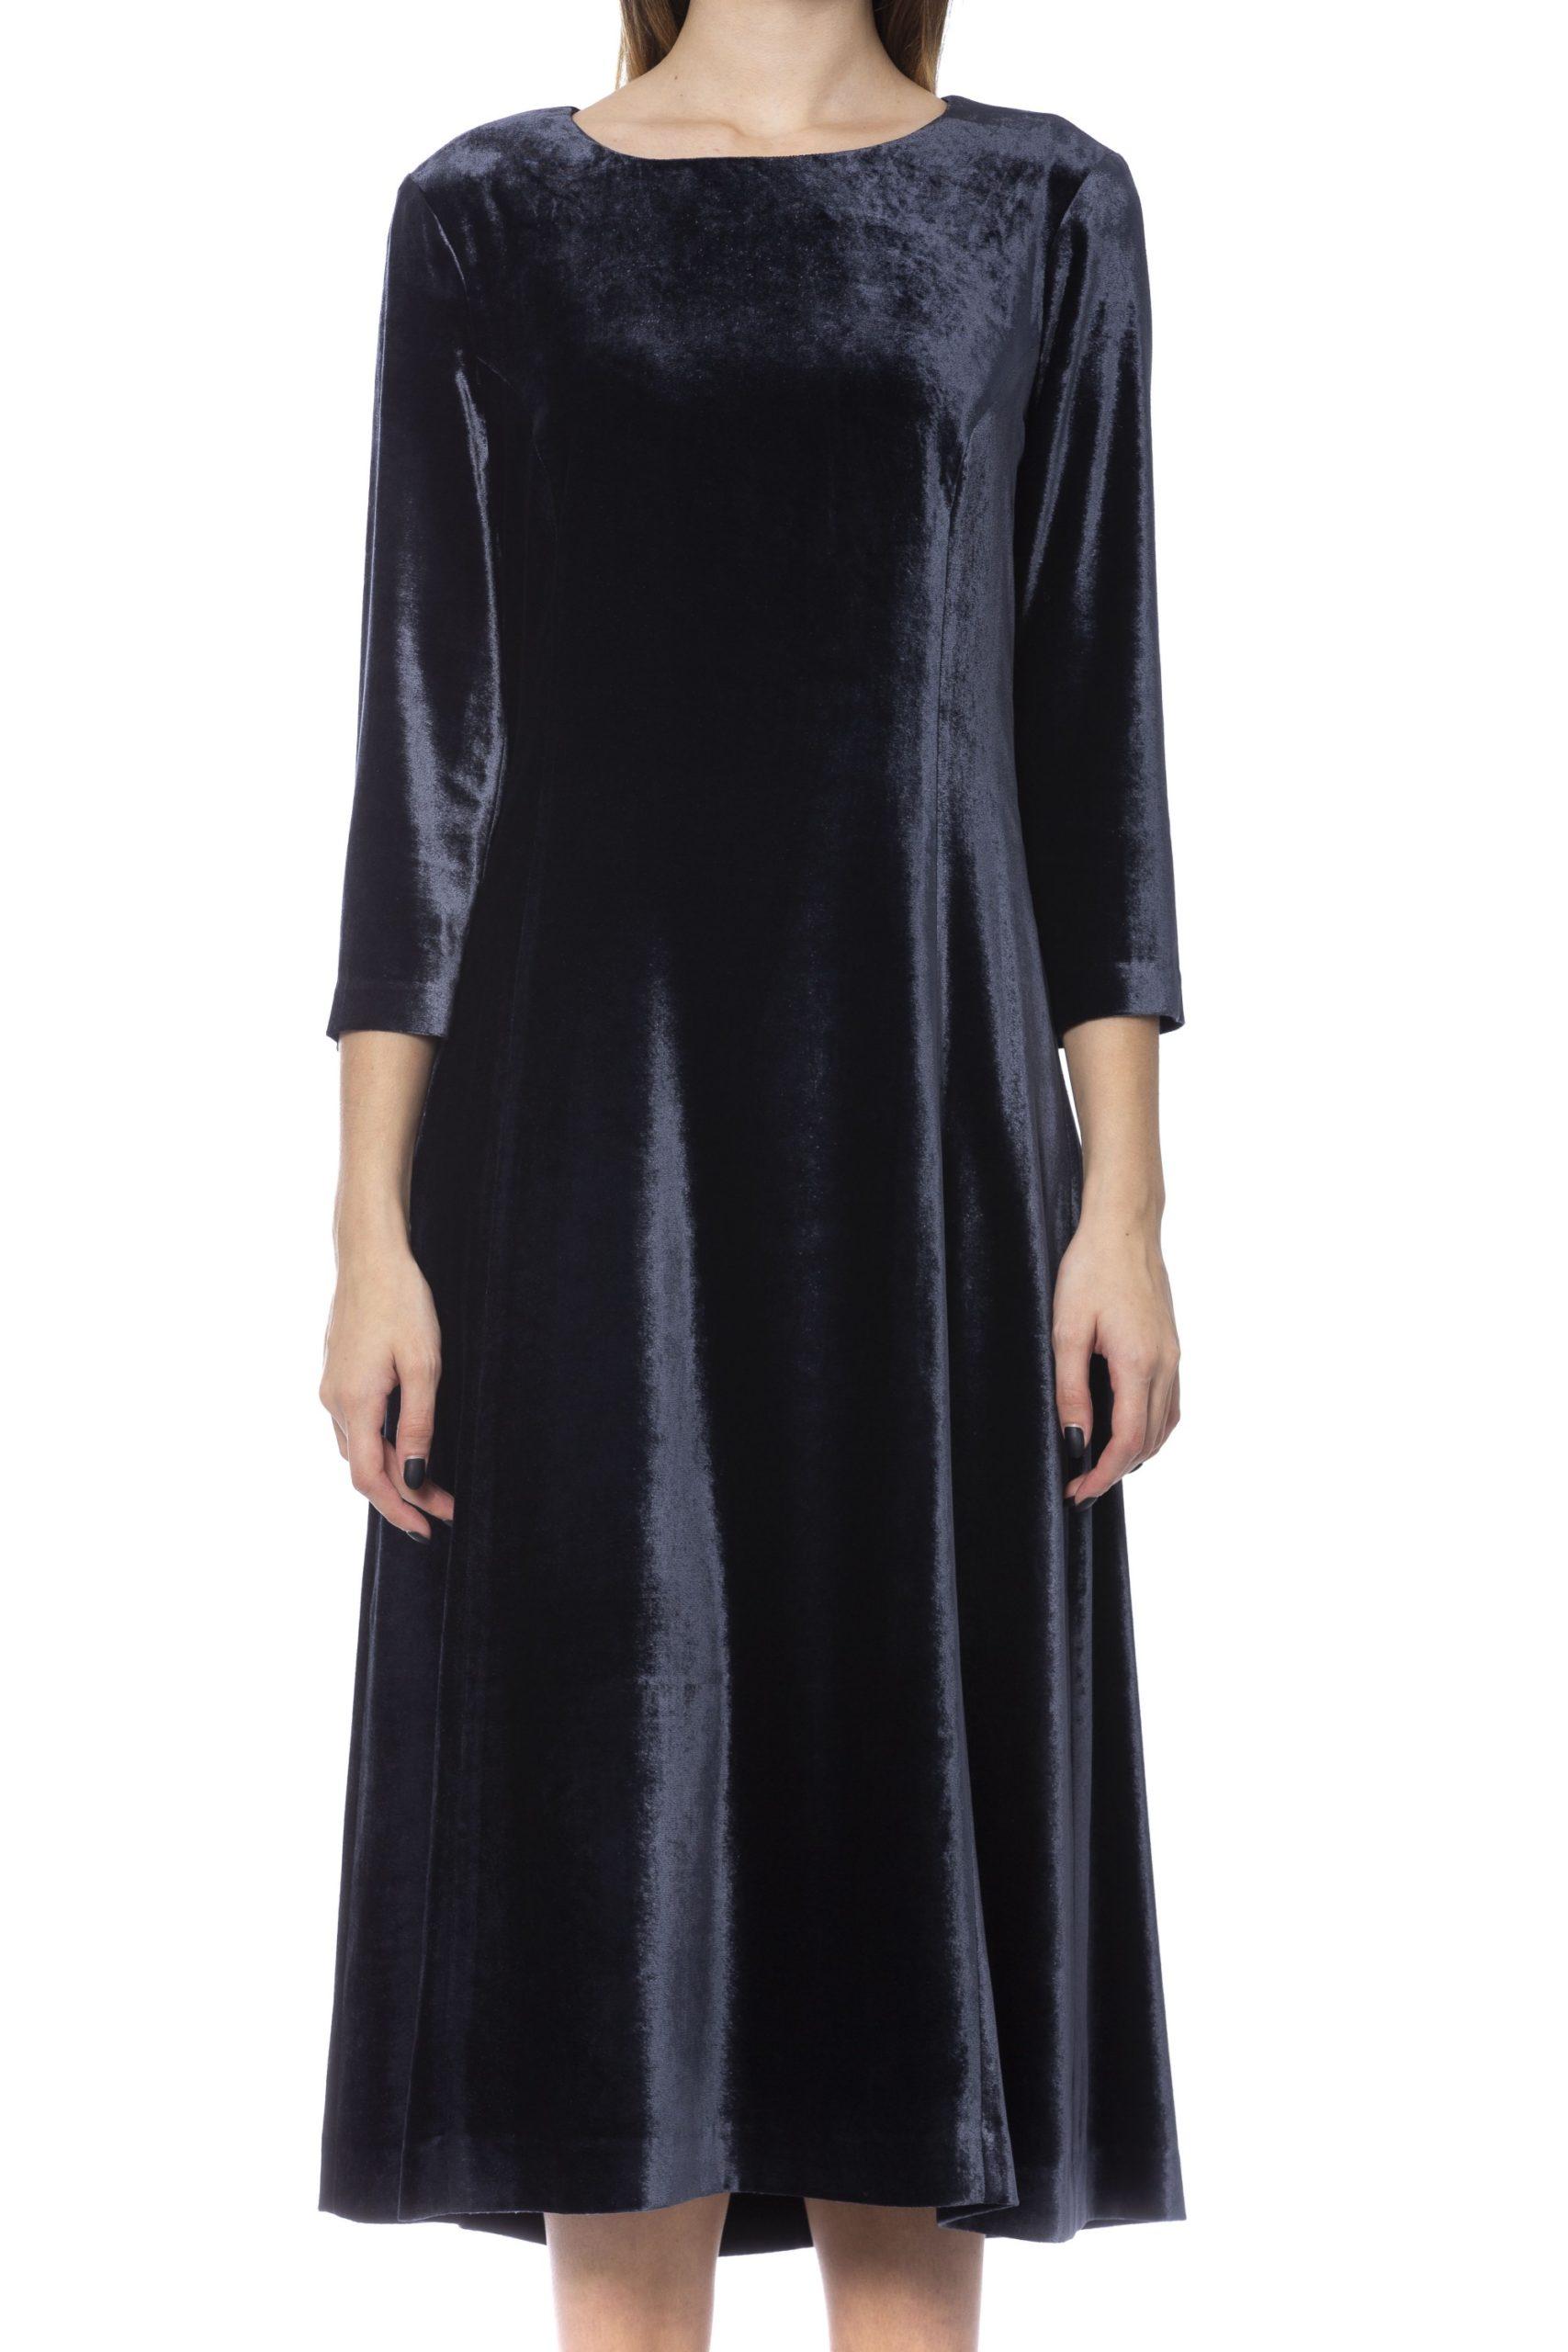 Peserico Women's Dress Blue PE993468 - IT42 | S